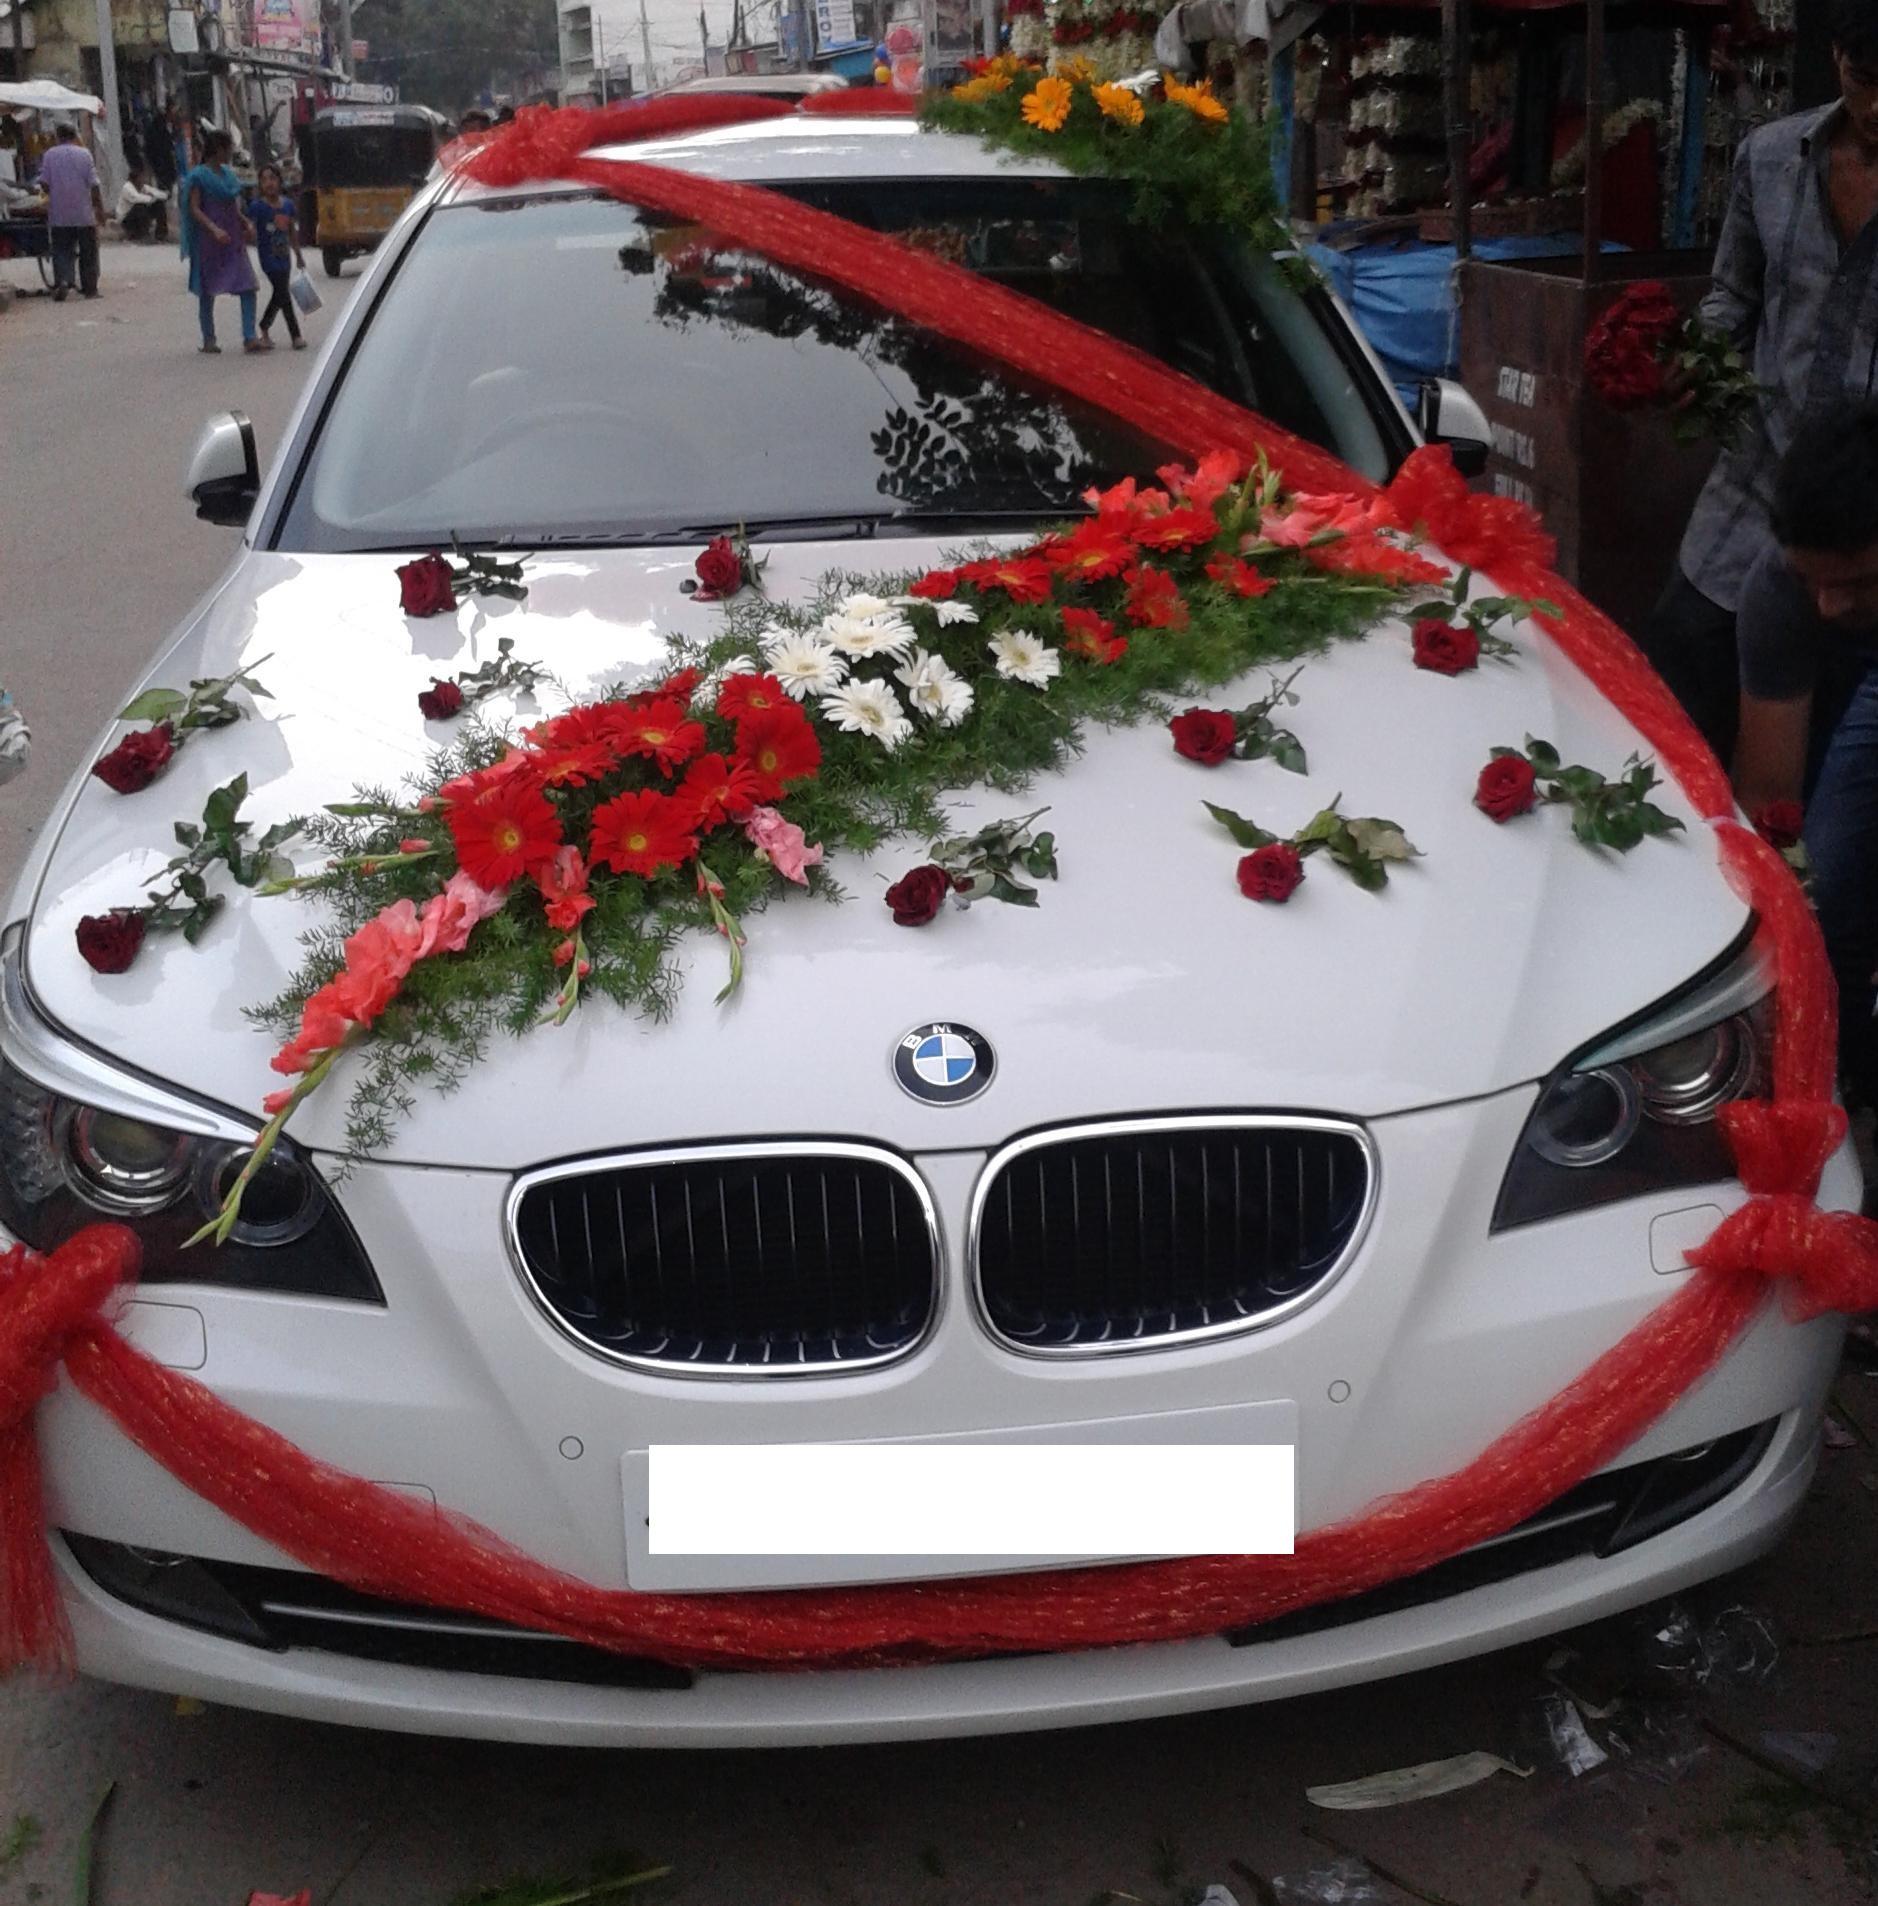 Decorate Wedding Car  Car Decoration for Wedding in Some Ways